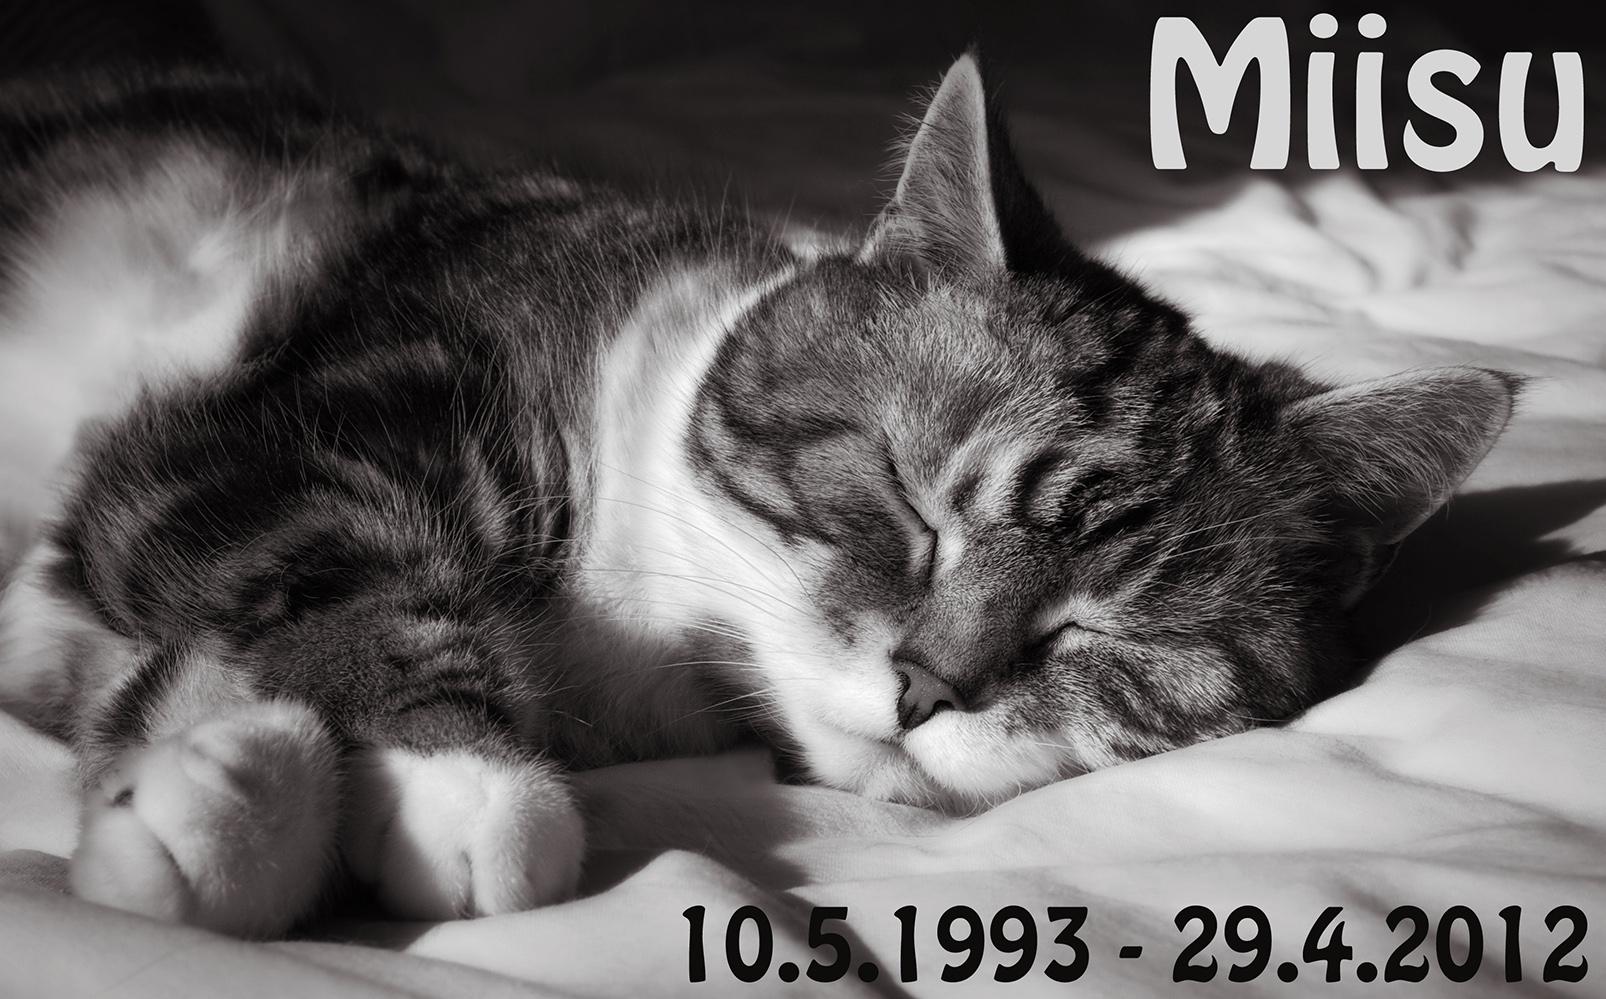 Miisu [HCS fs 09 22] female 1993-05-10 - 2012-04-29, photo 194100, 2012-04-28